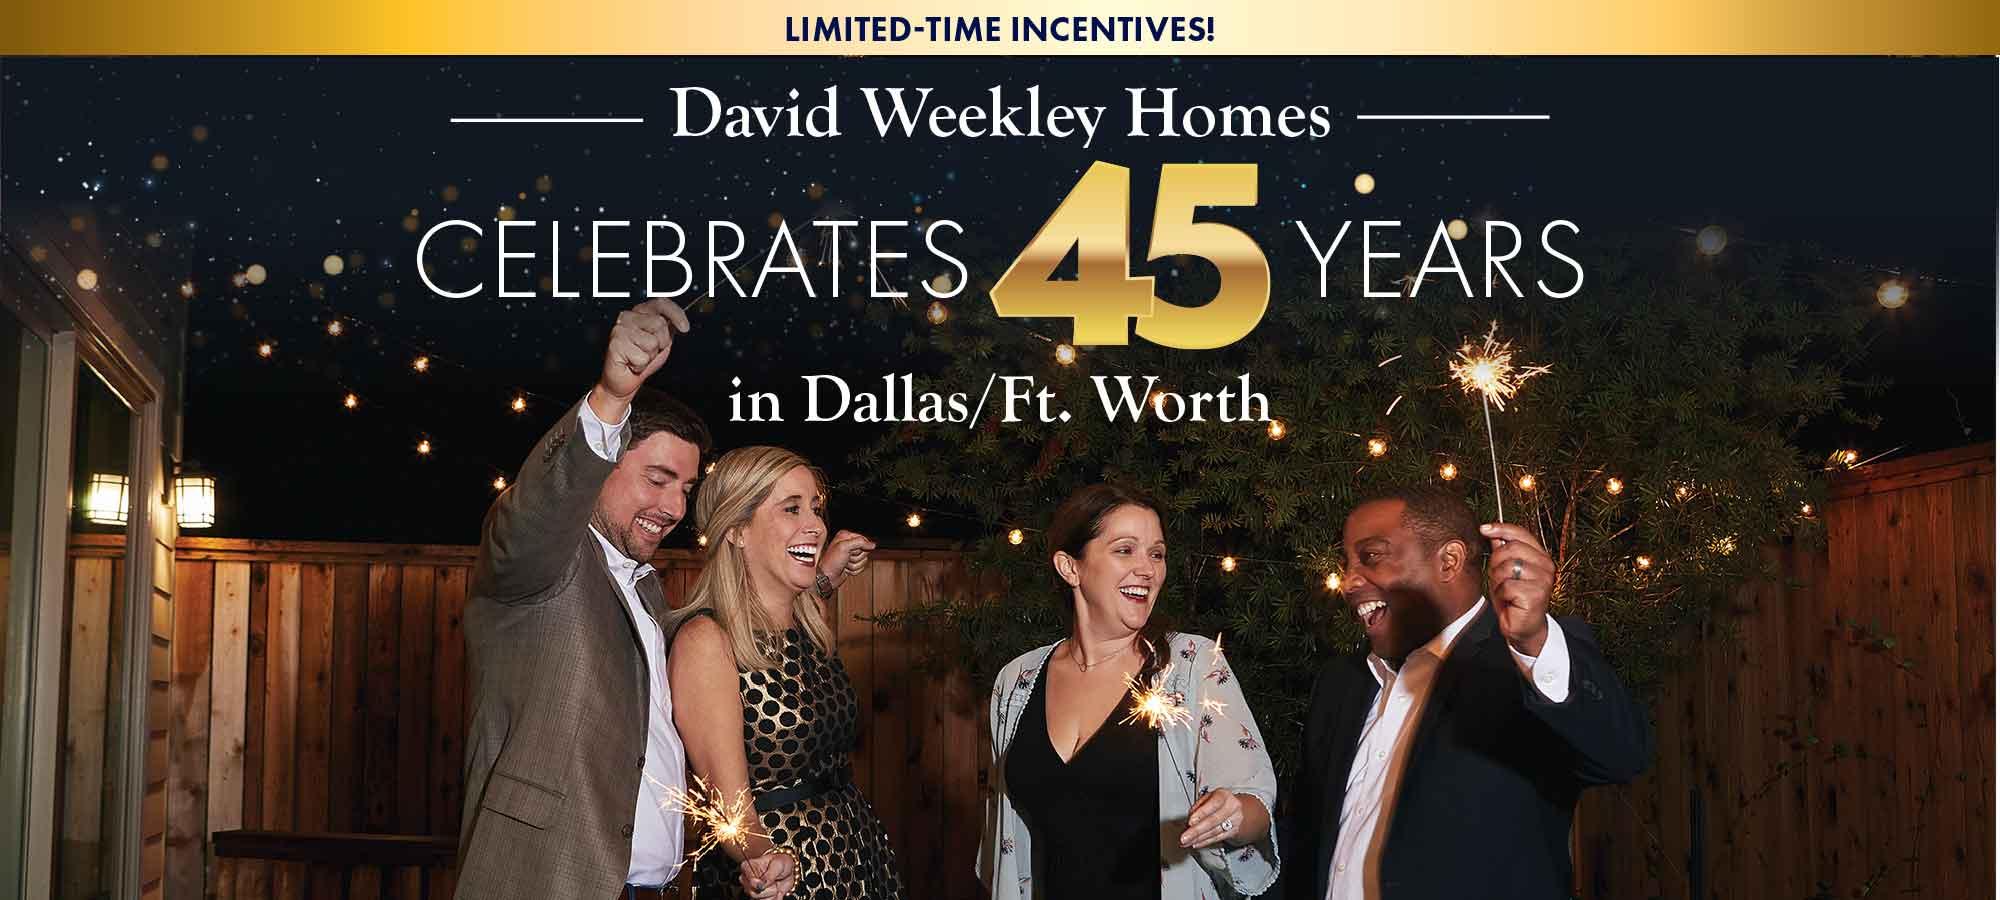 Anniversary Savings Event in Dallas/Ft. Worth